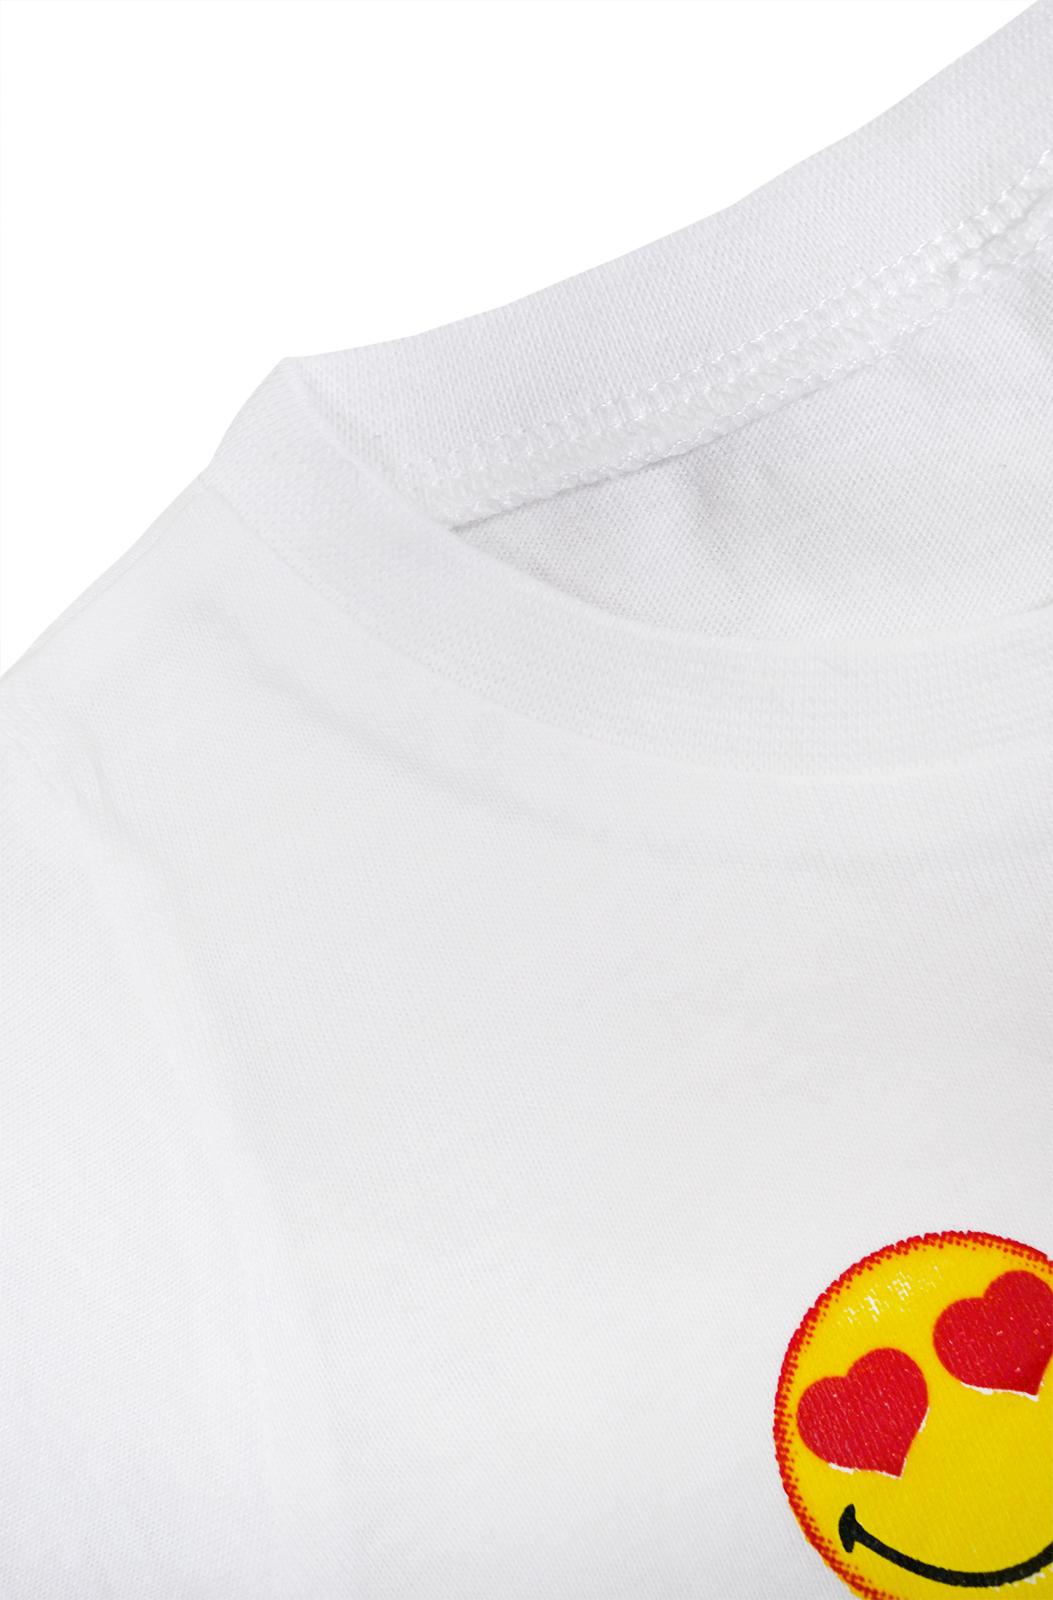 Baby Girls Emoji Top Kids Cotton T shirt New Smiley World Short Sleeve Newborn